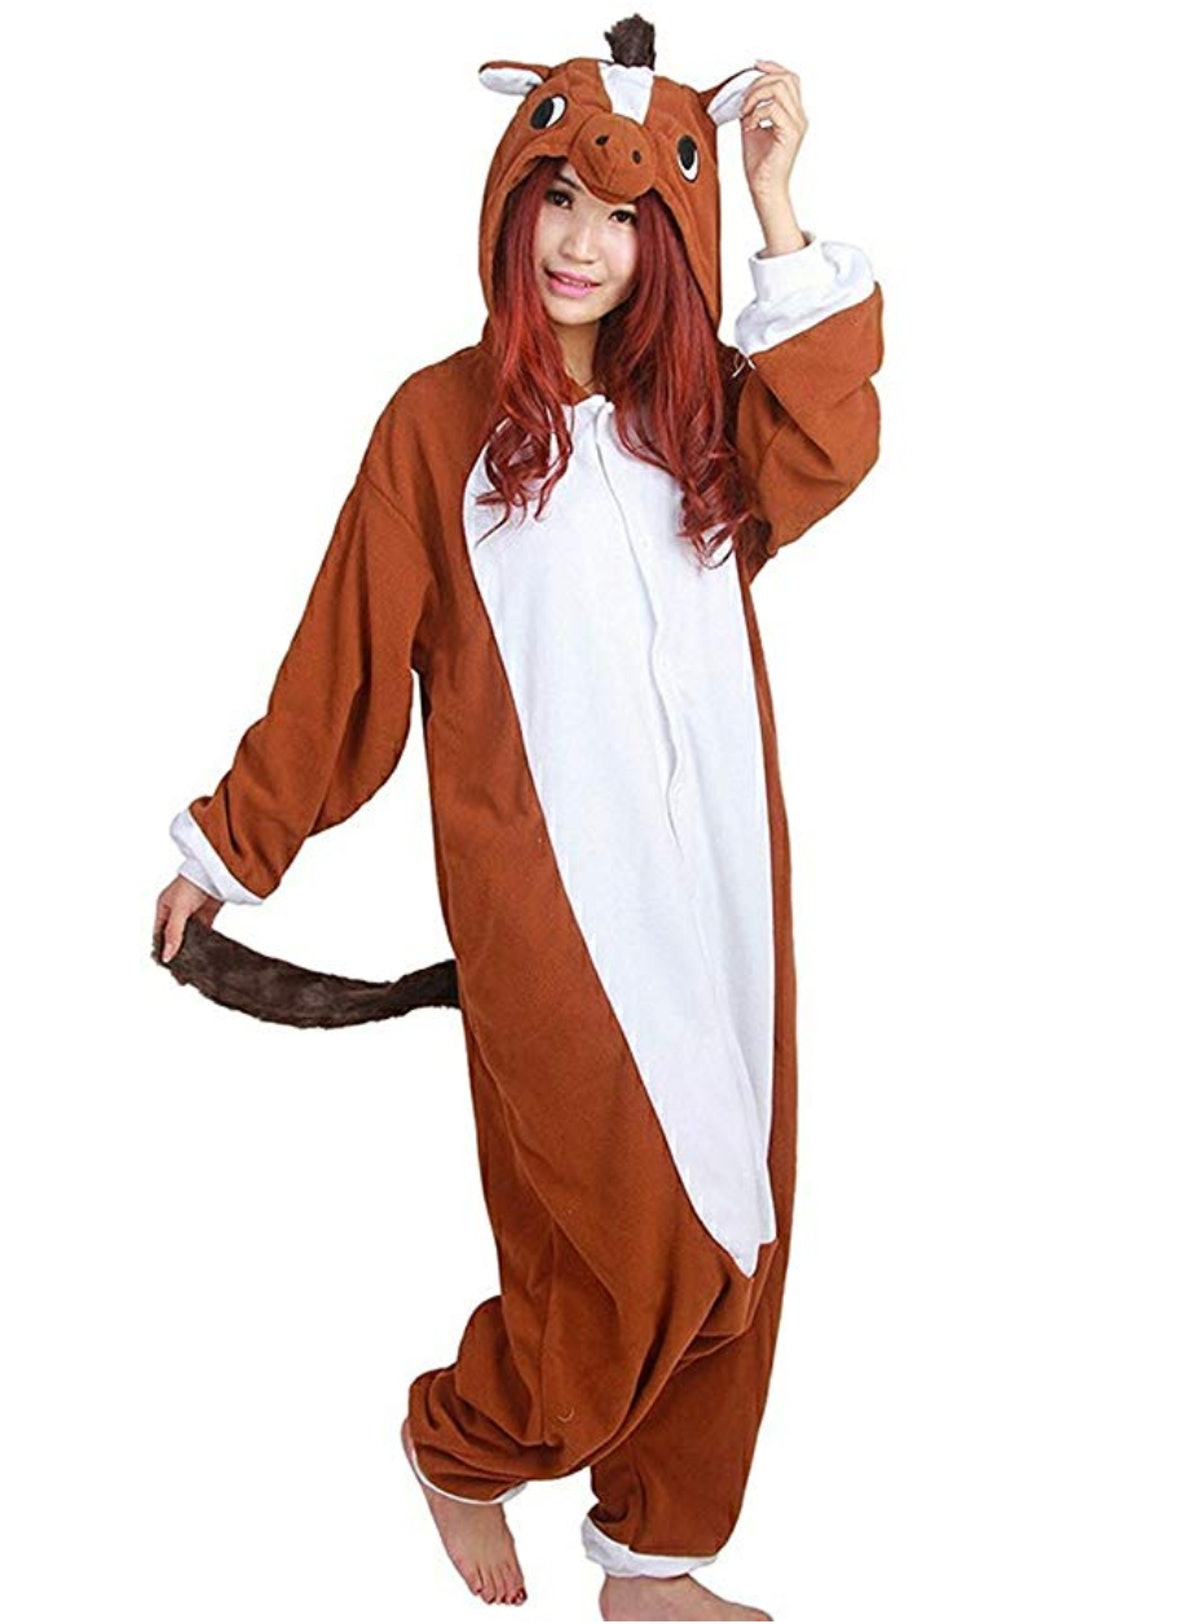 Xiqupjs Adult Onesie Animal Pajamas Cosplay Costume One Piece Halloween Sleepwear For Women Teens